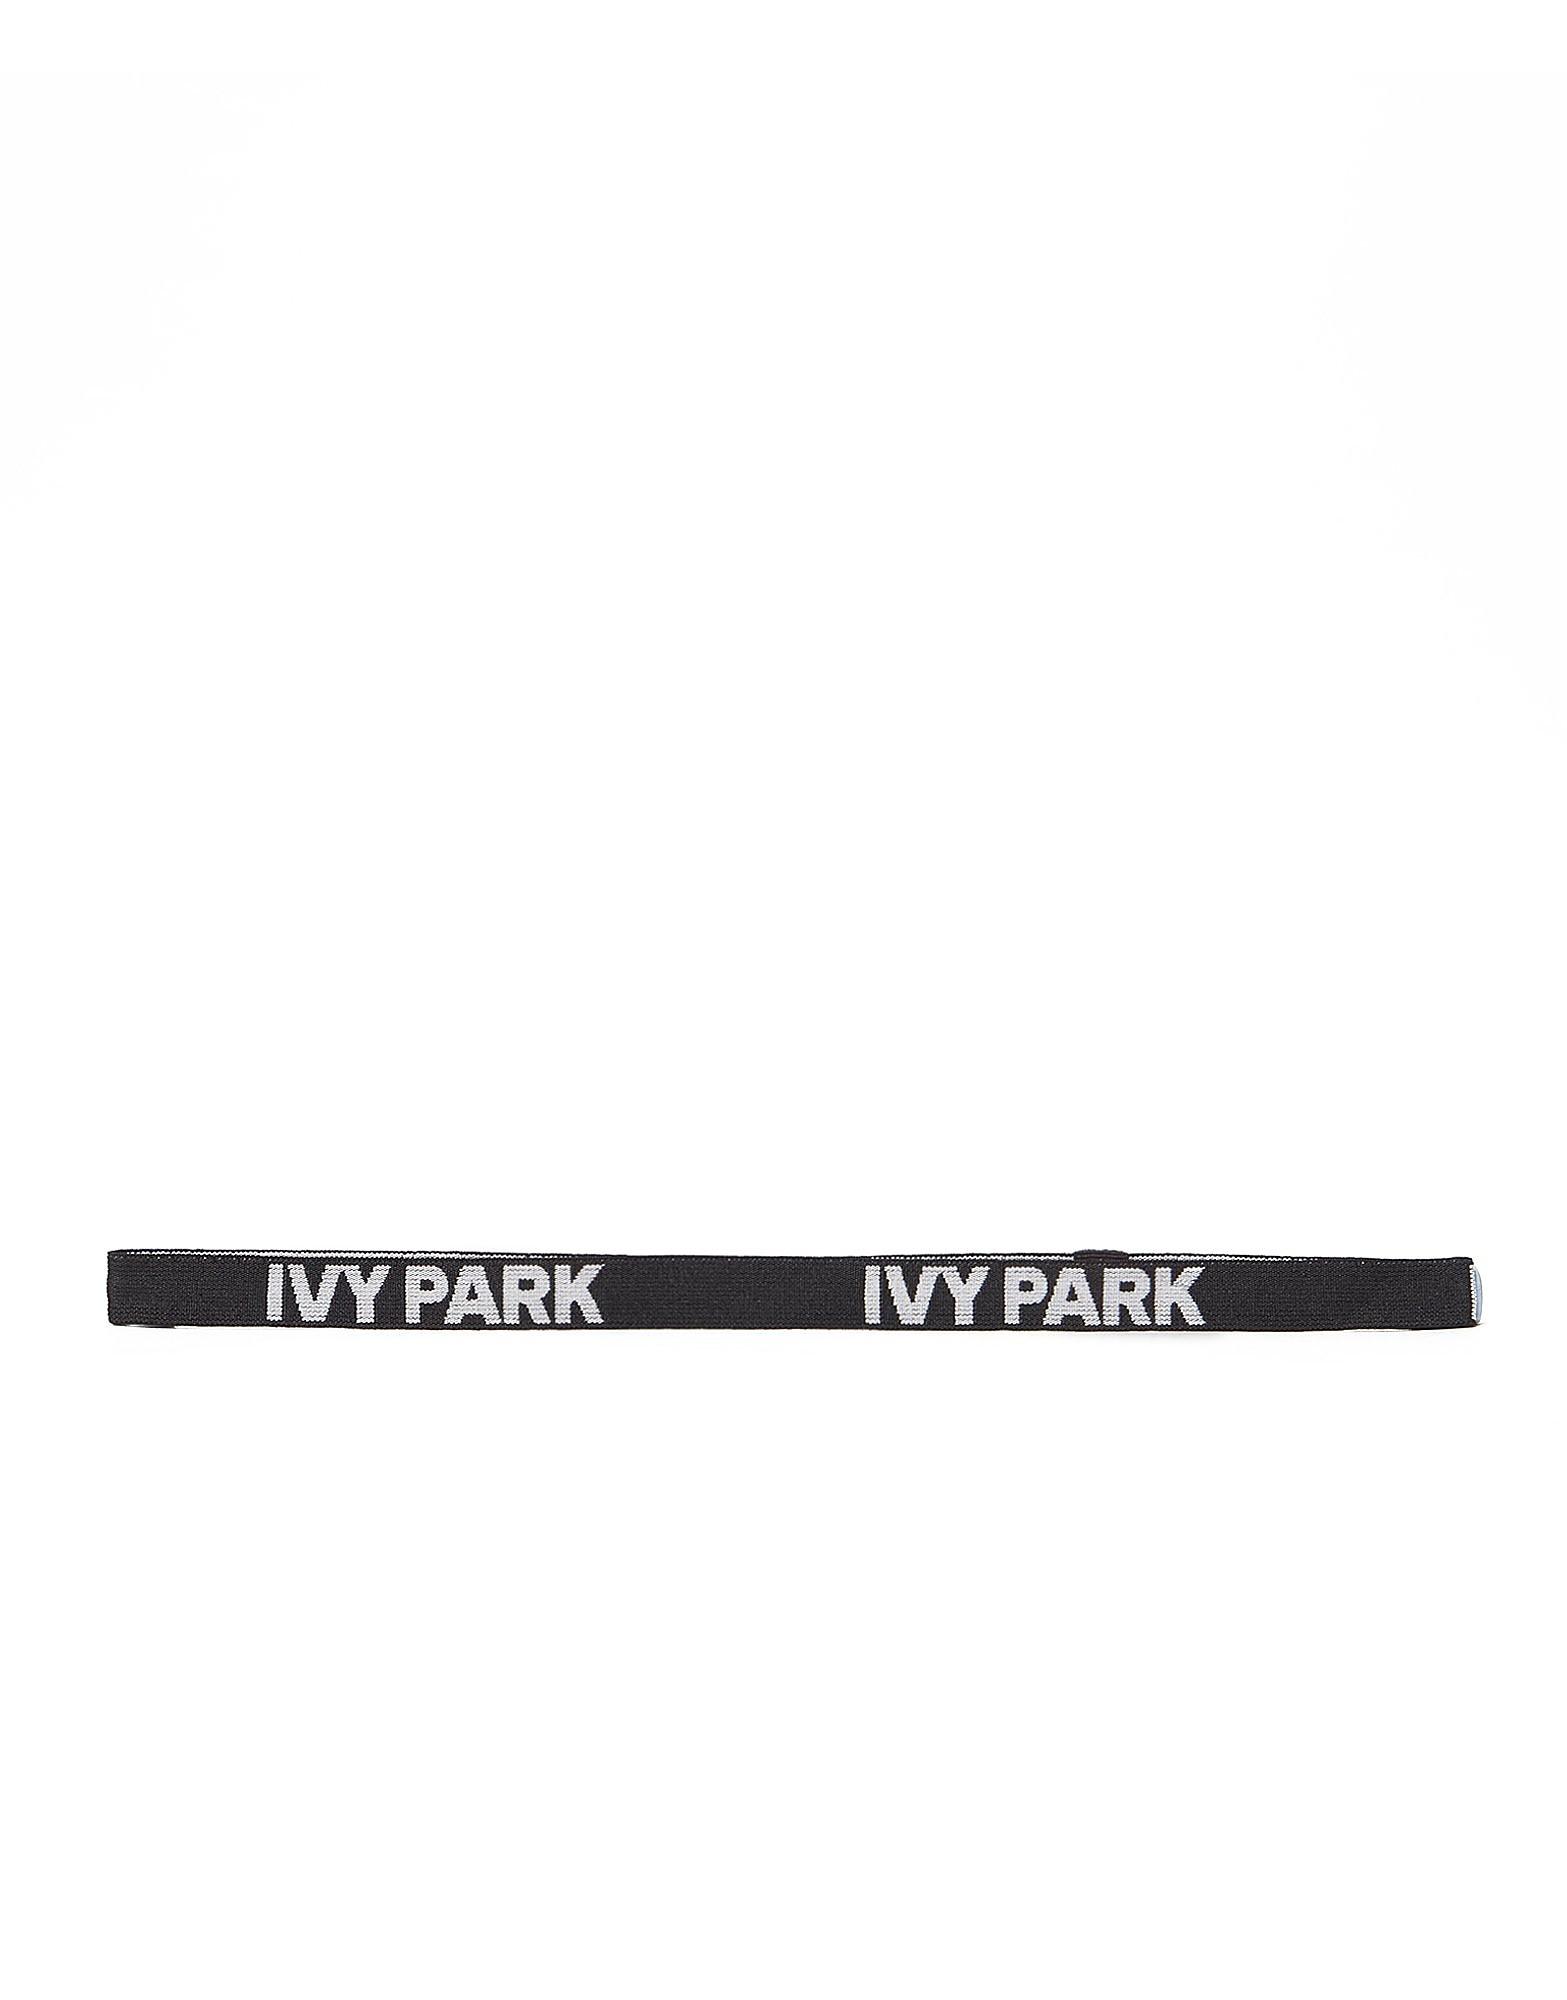 IVY PARK 2 Pack Skinny Headband